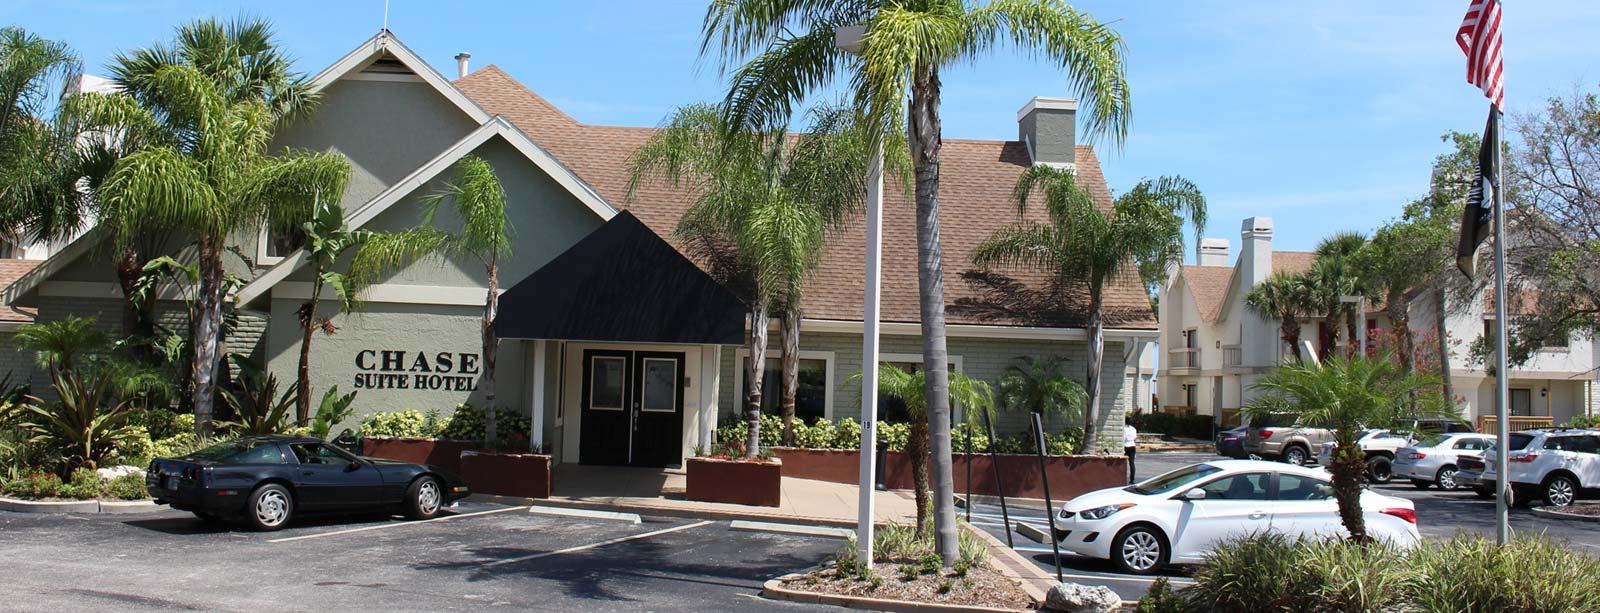 Studios 2 Bedroom Suites Tampa Fl Chase Suite Hotel